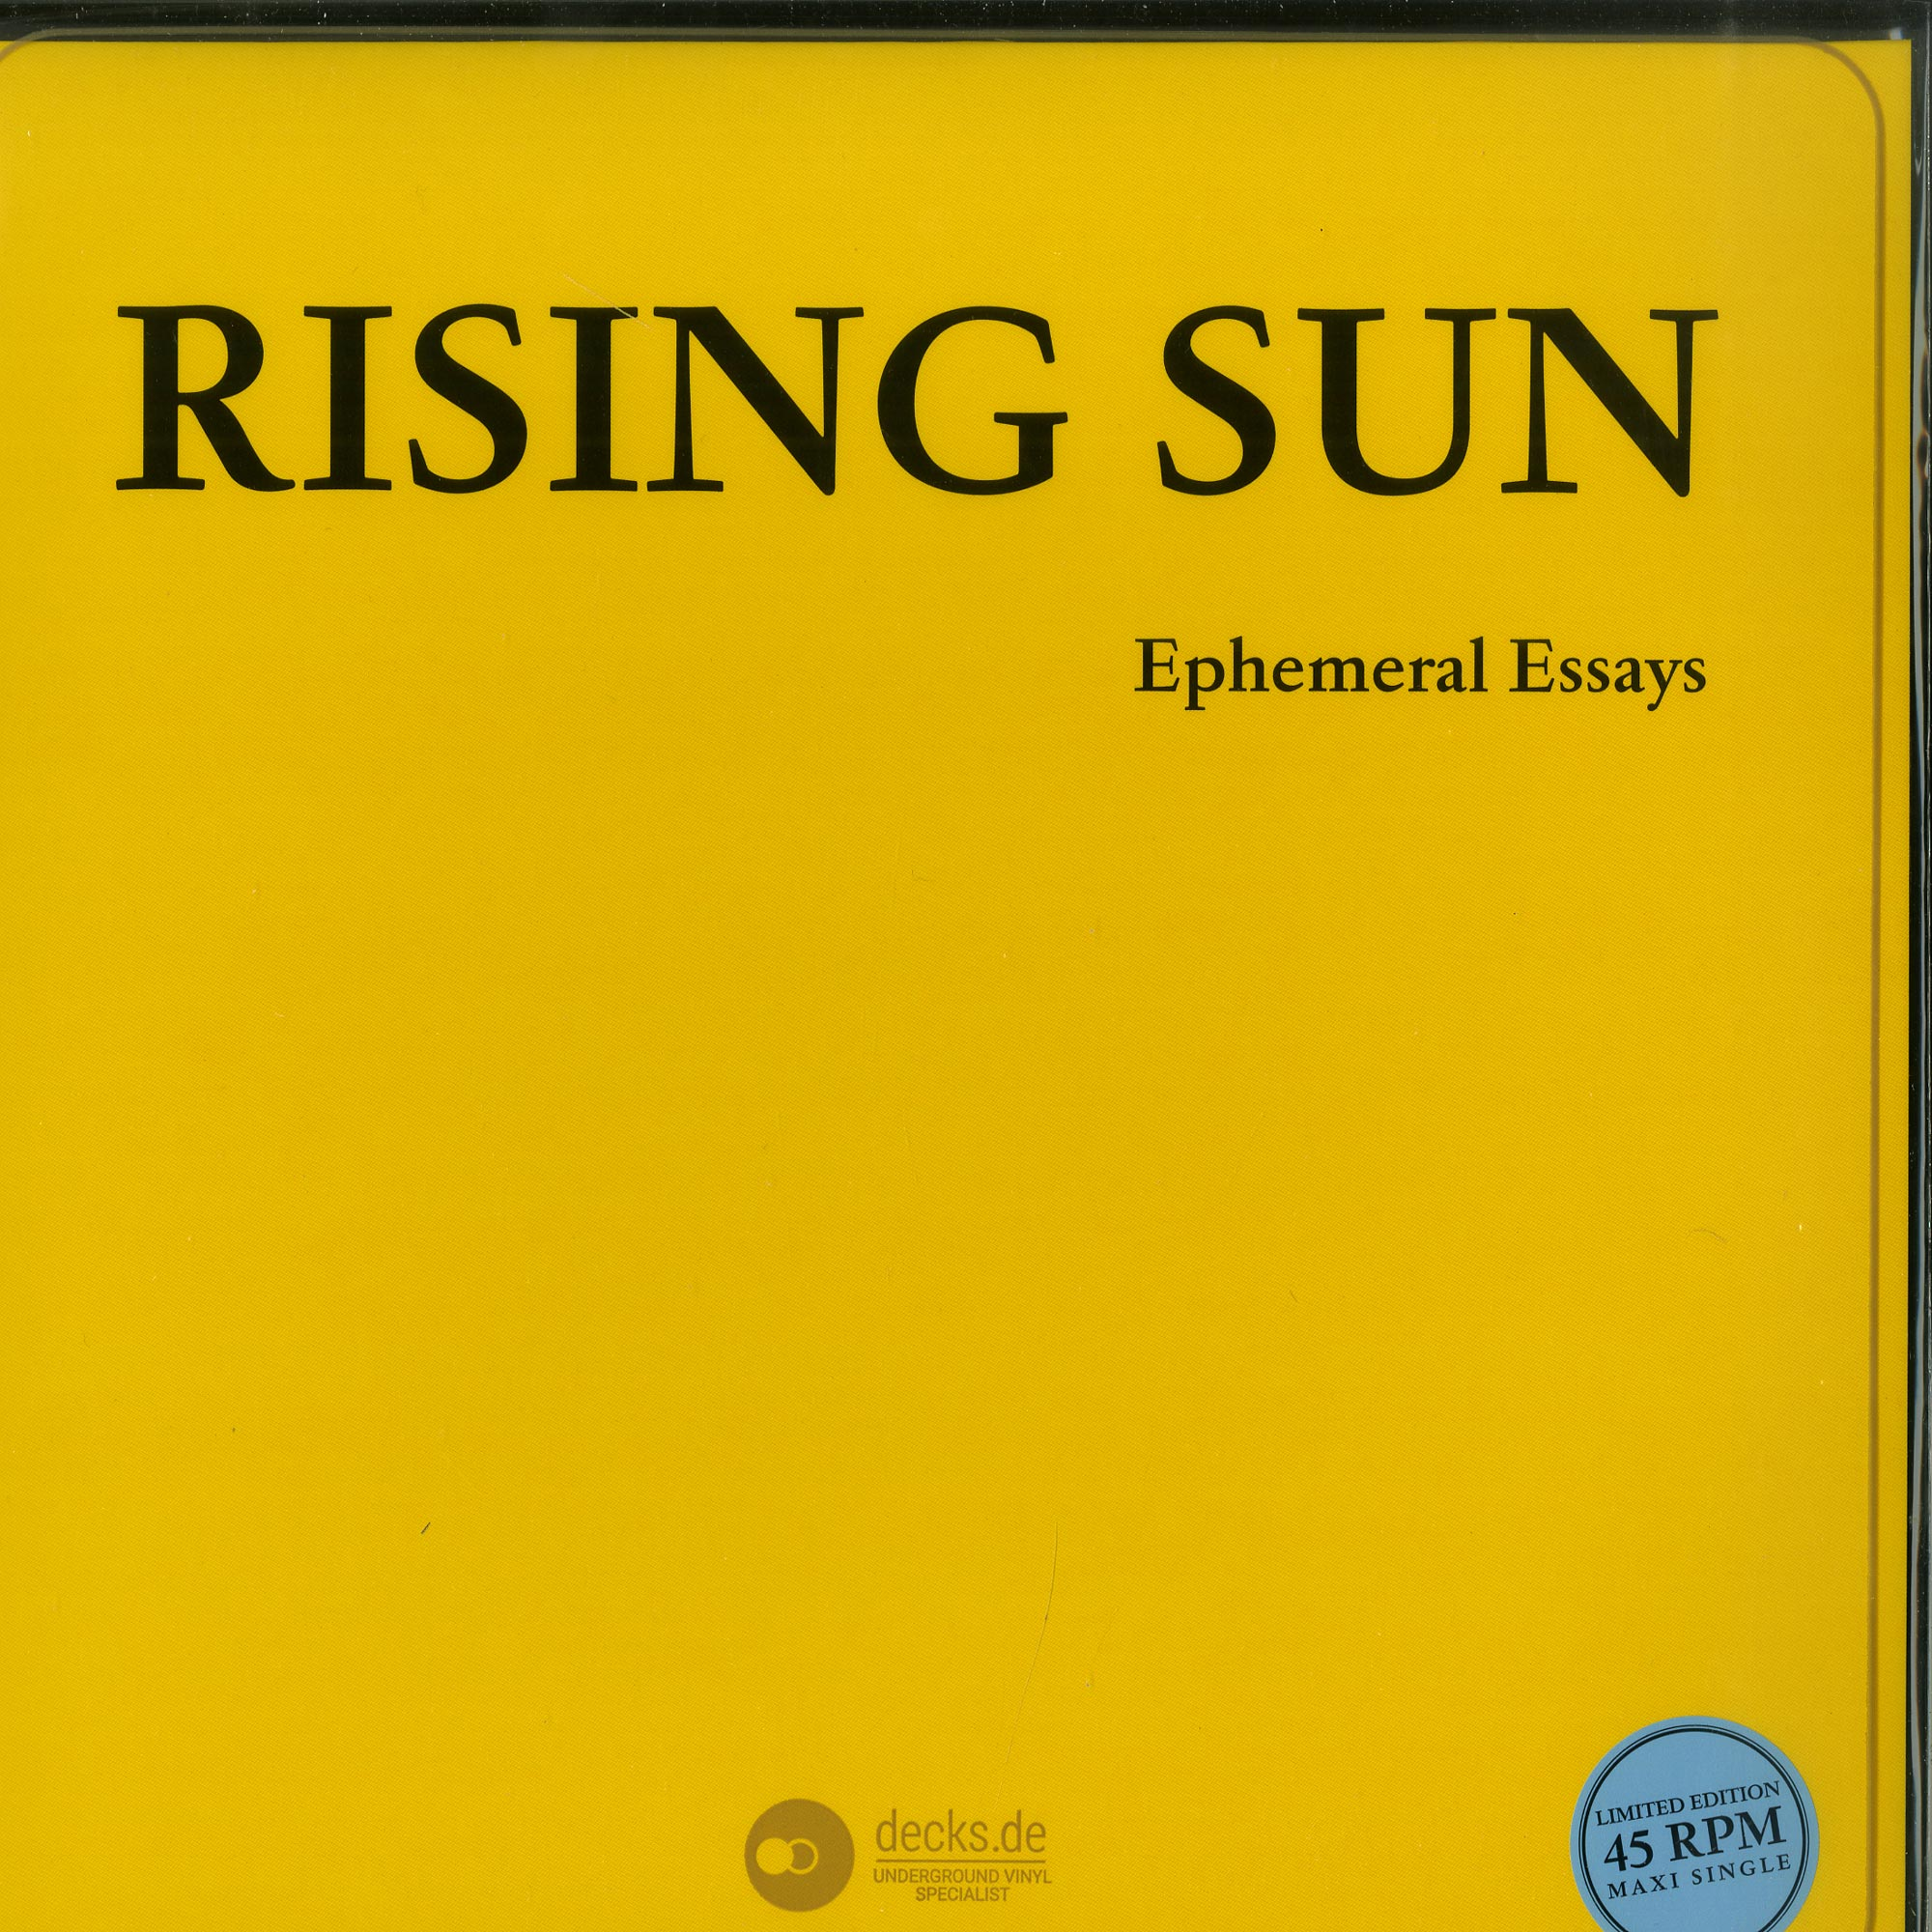 Rising Sun - EPHEMERAL ESSAYS